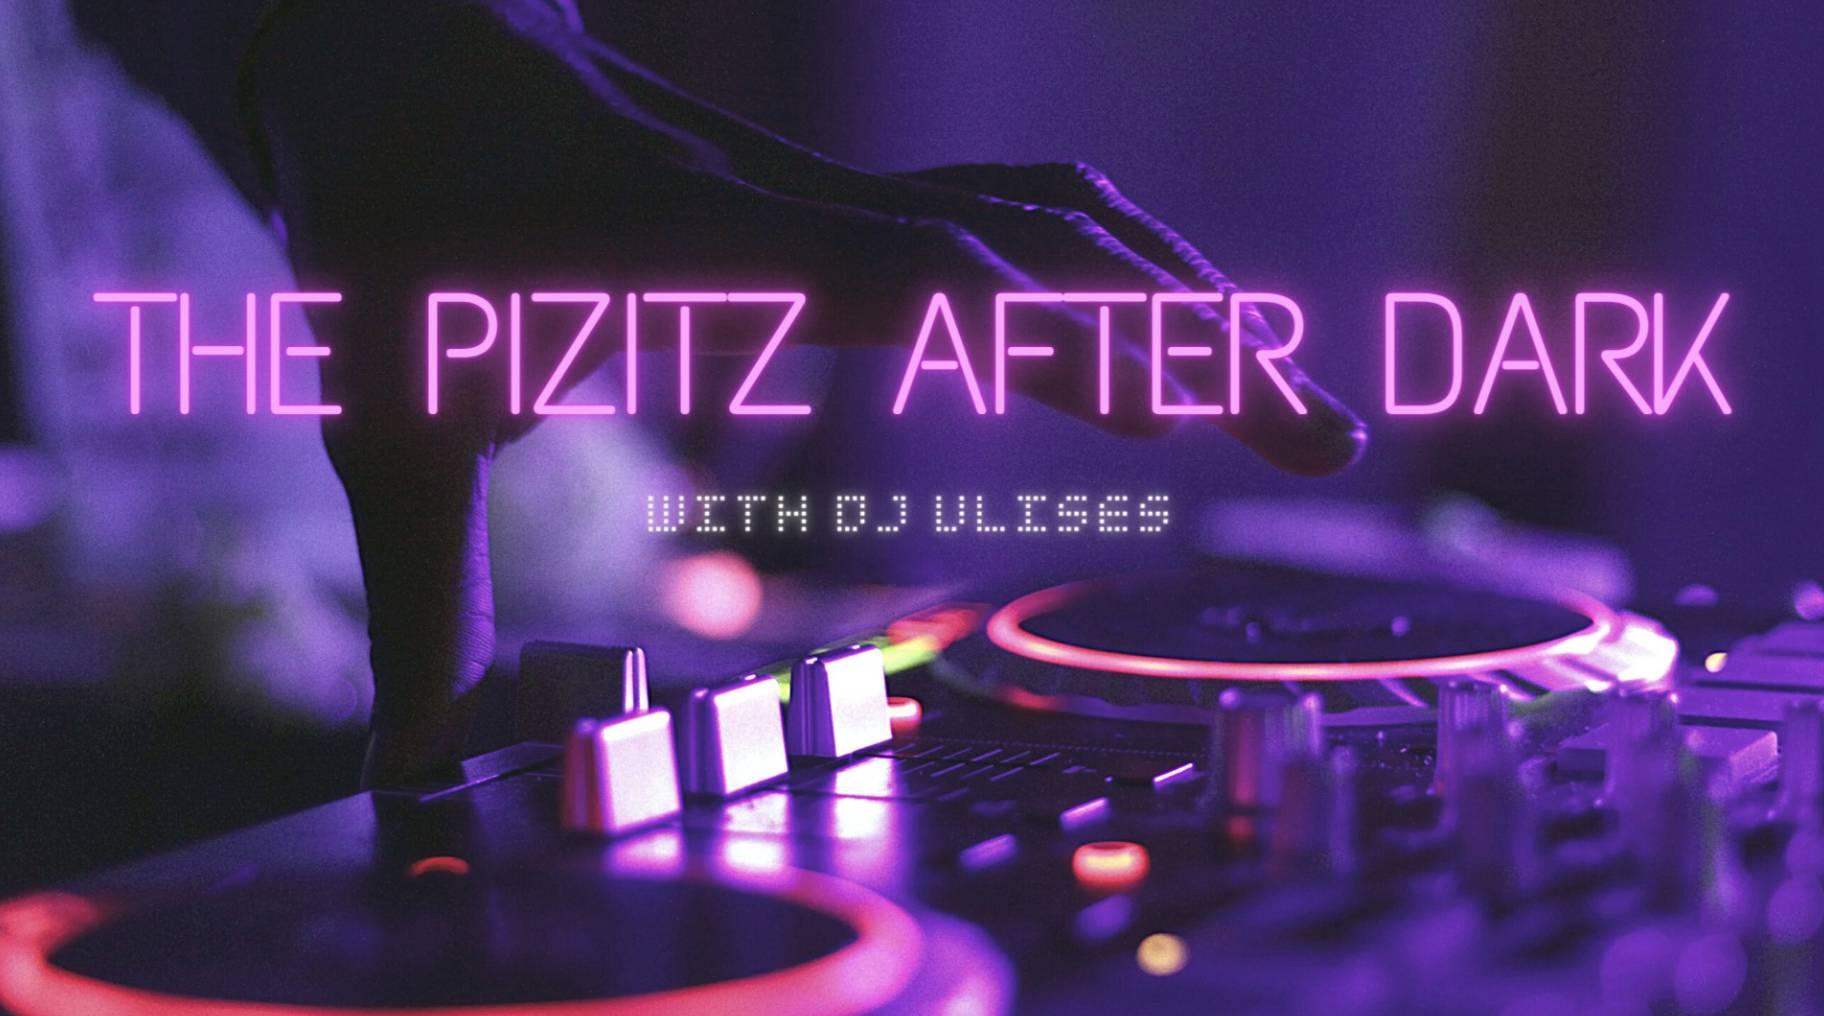 The Pizitz After Dark